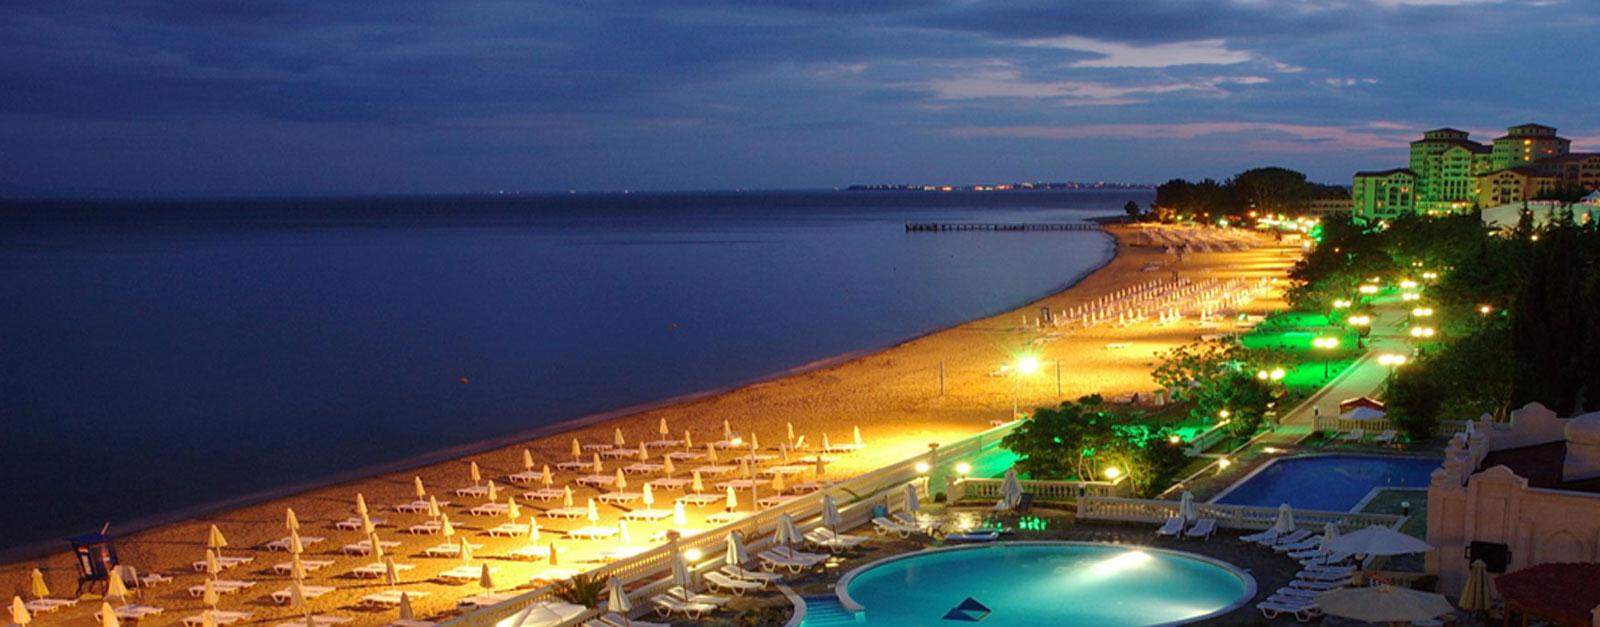 elenite resort letovanje hoteli aranzmani cene